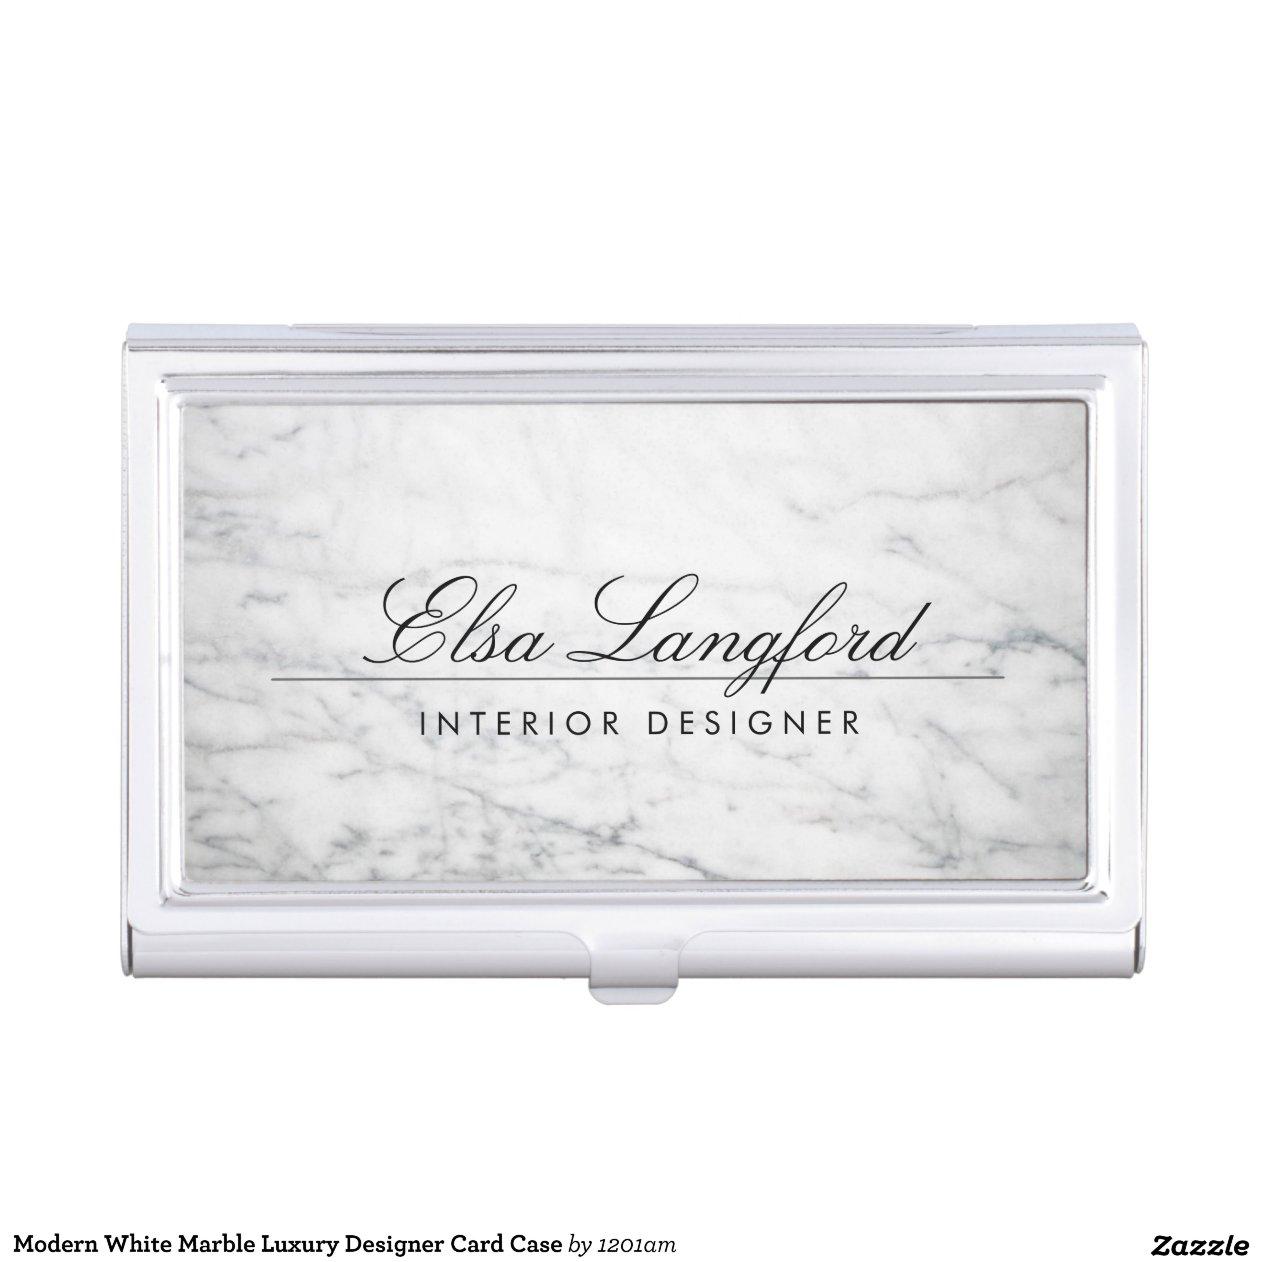 Modern White Marble Luxury Designer Card Case Business